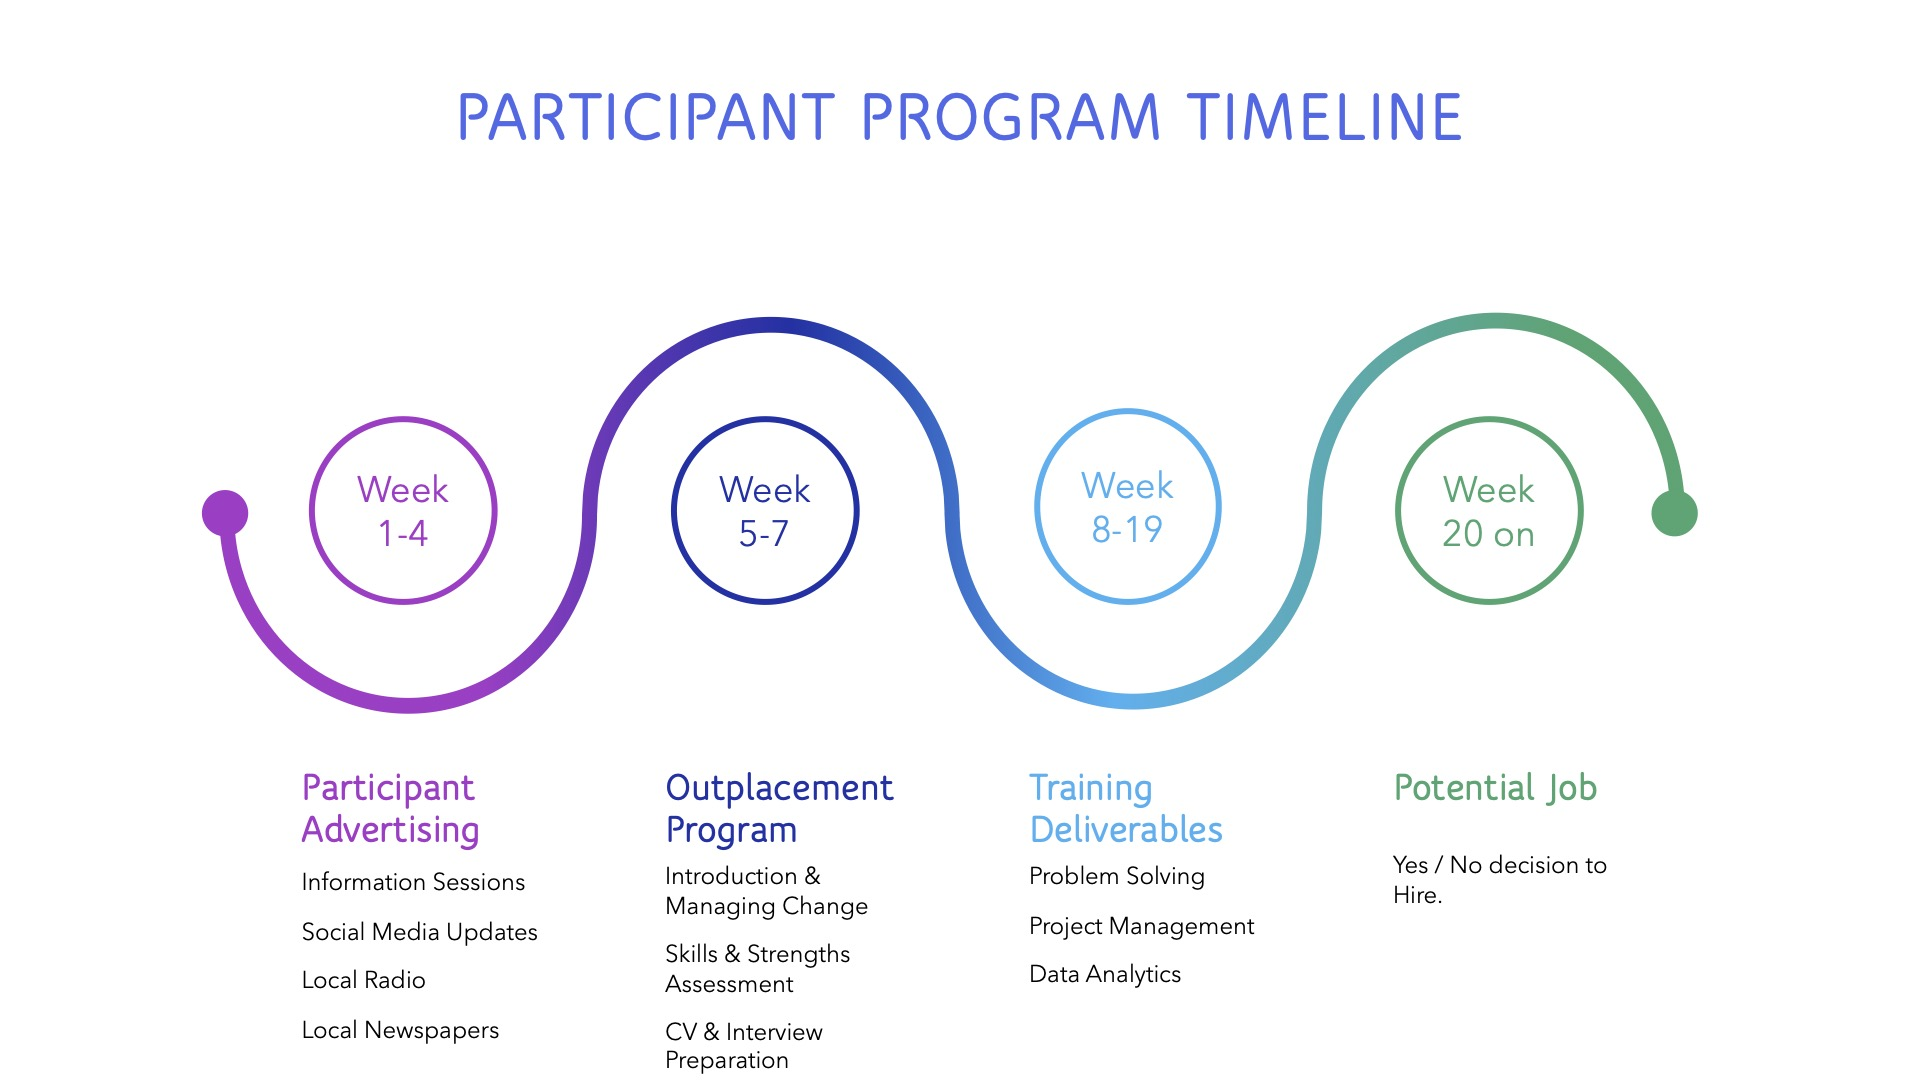 Participant Program Timeline Rev1_Updated 150421[2] - Read-Only copy